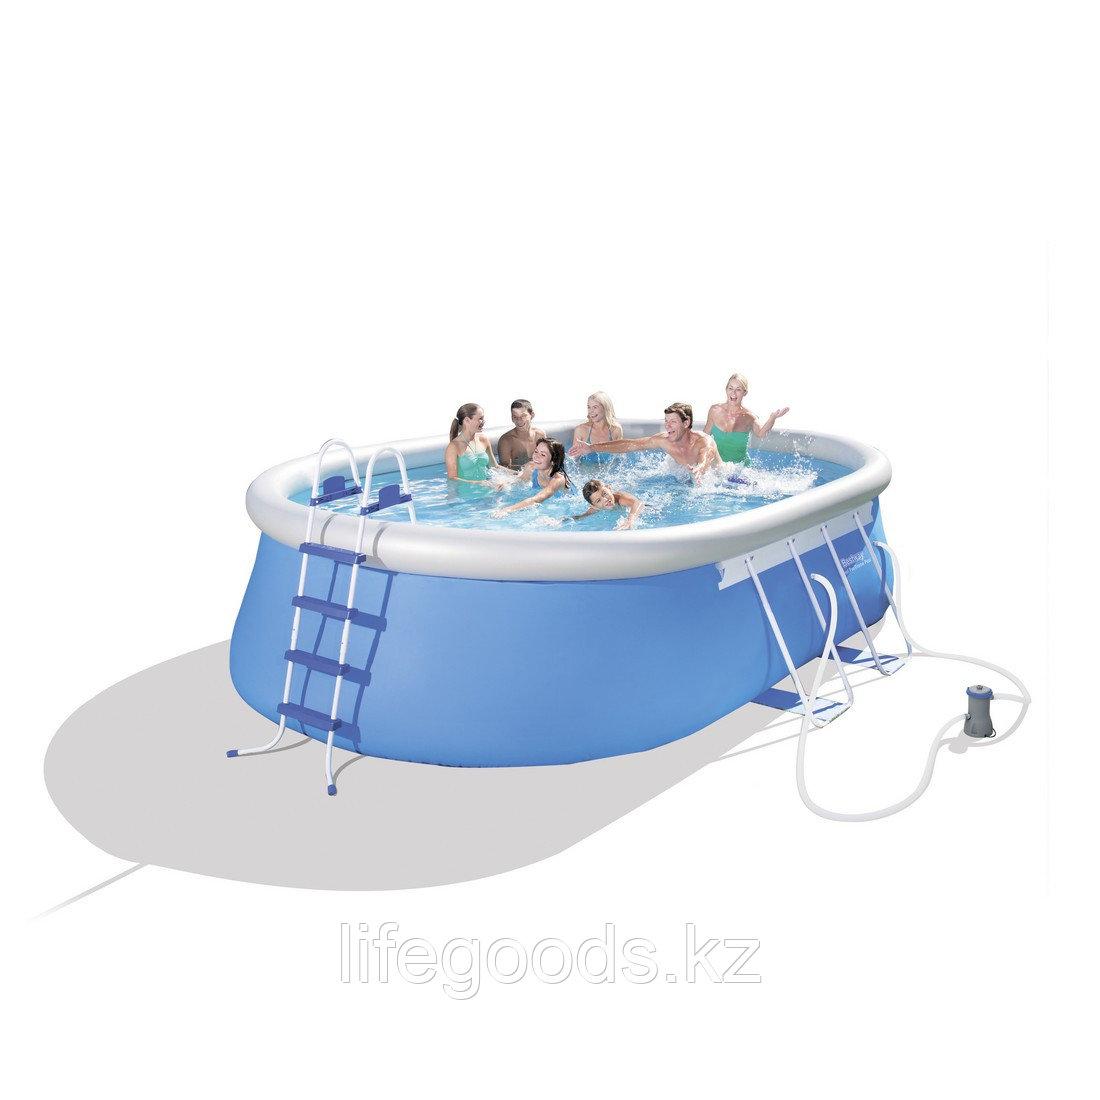 Надувной бассейн Fast Set 549х366х122 см Bestway 56461 (56153)